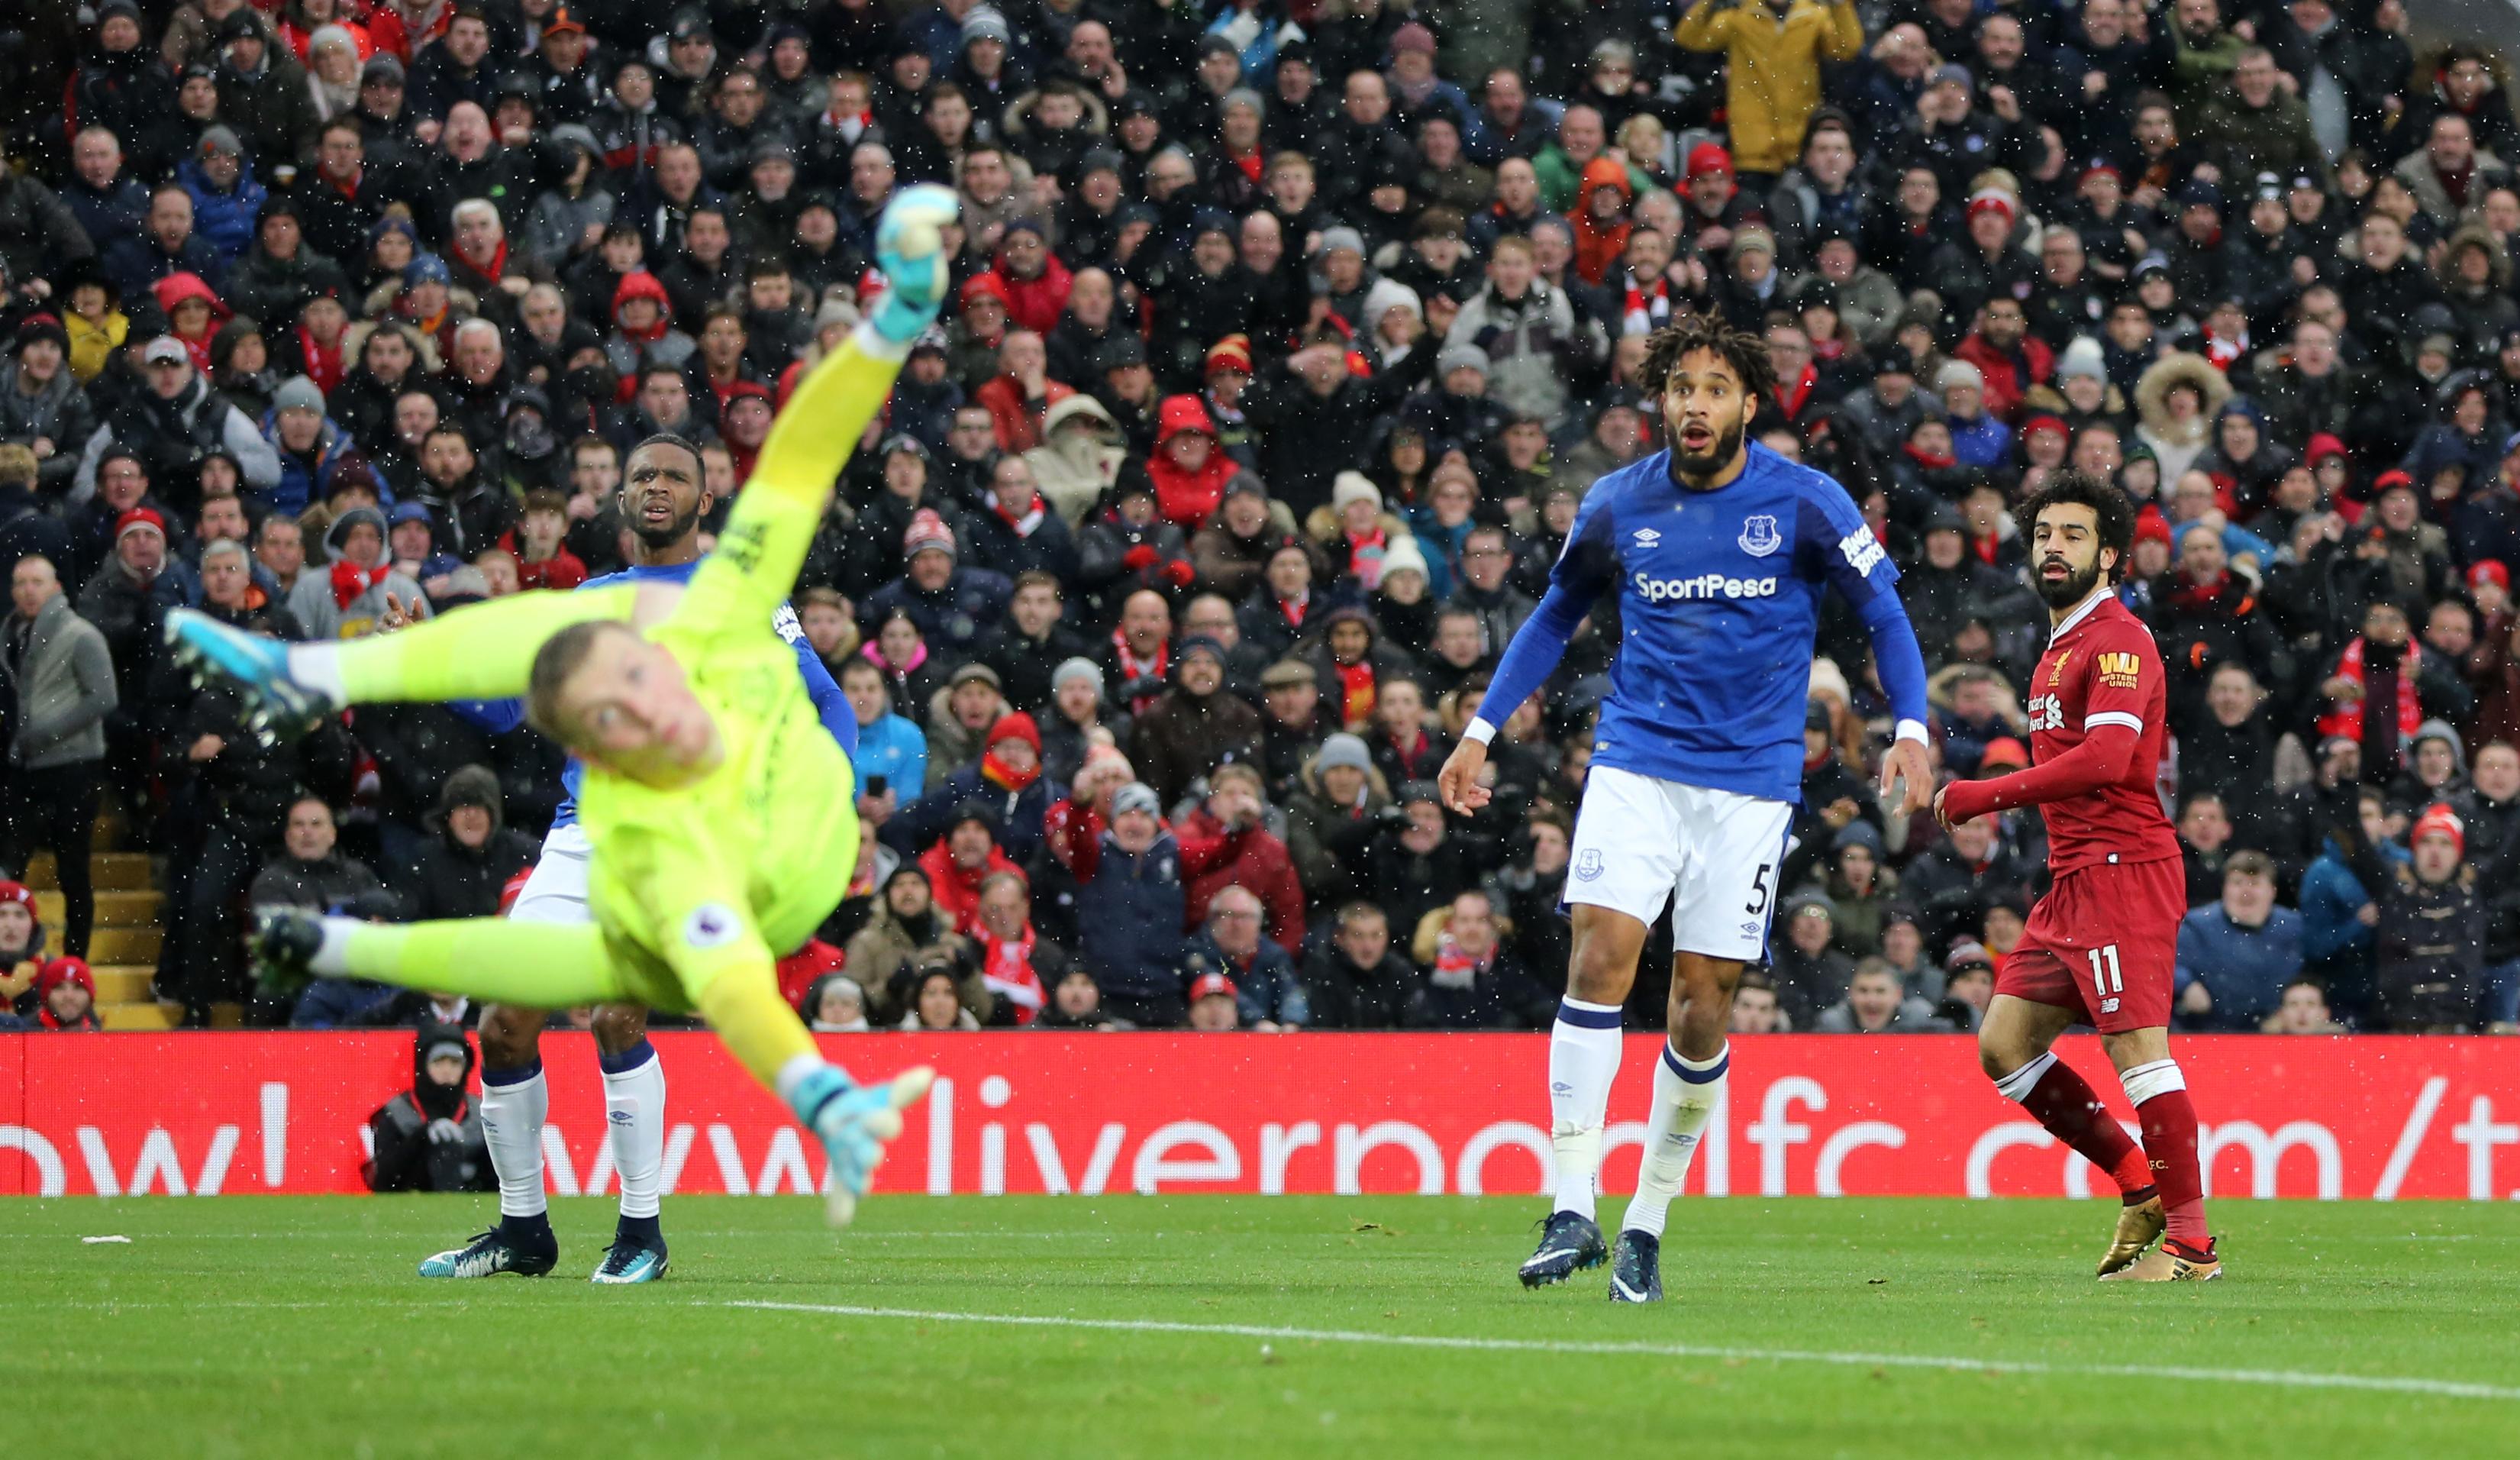 Everton boss Allardyce resonates with 'emotional' Klopp